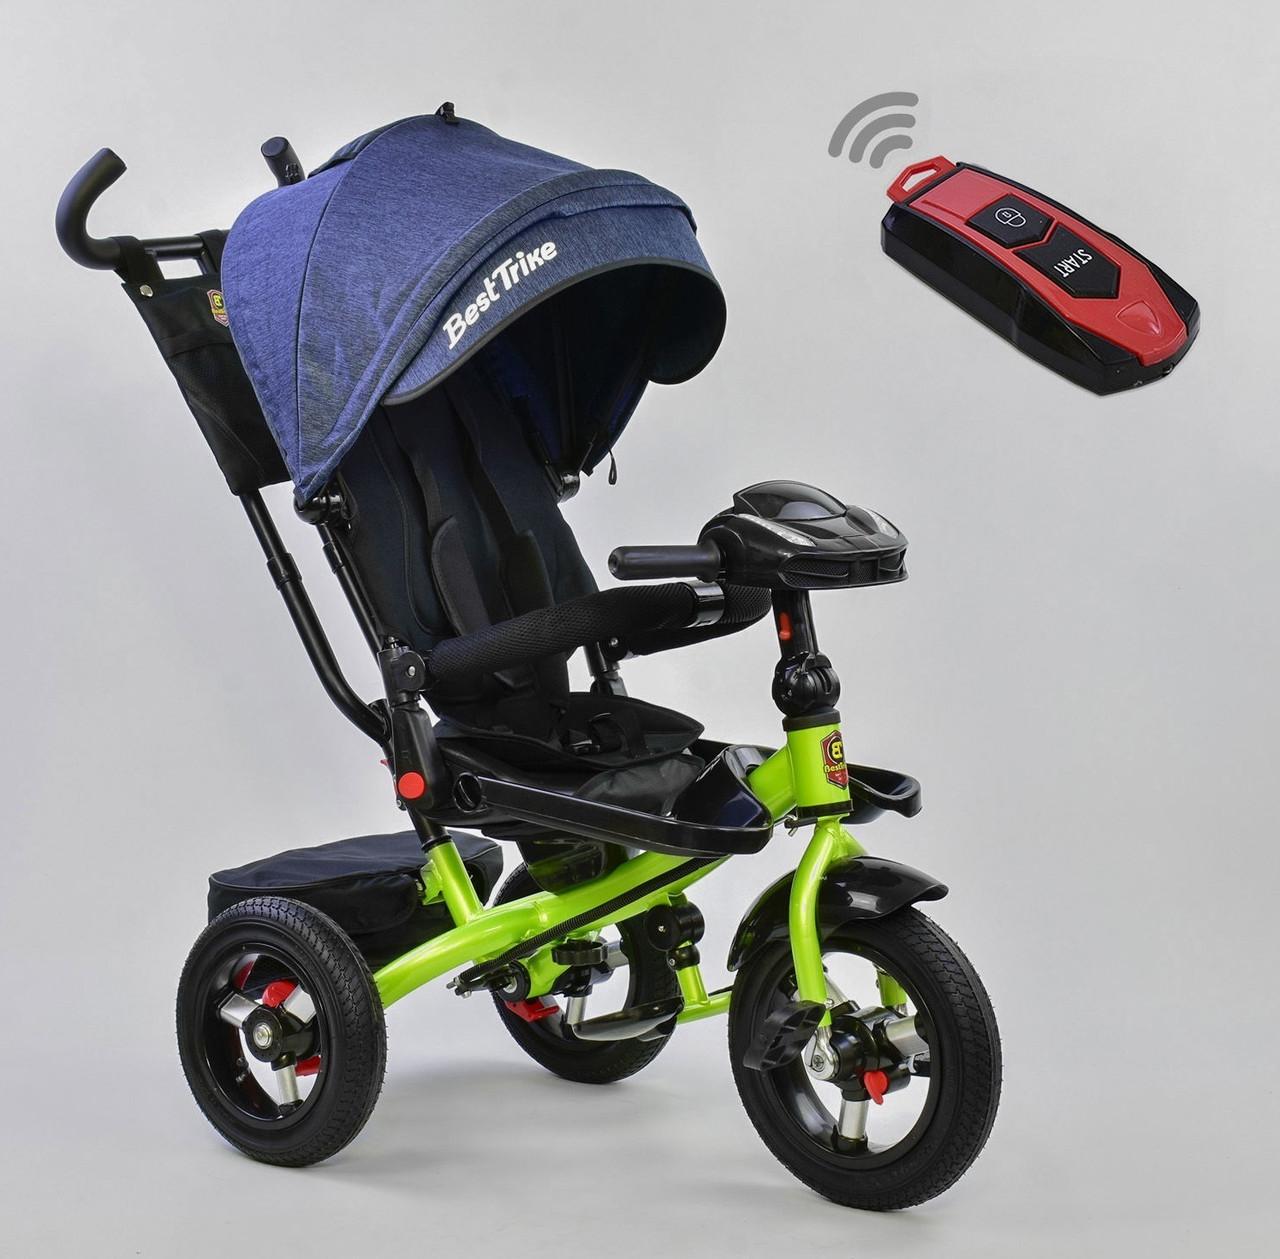 Best Trike Велосипед Best Trike 6088 F 1780 New Blue/Lime Green (6088 FN)